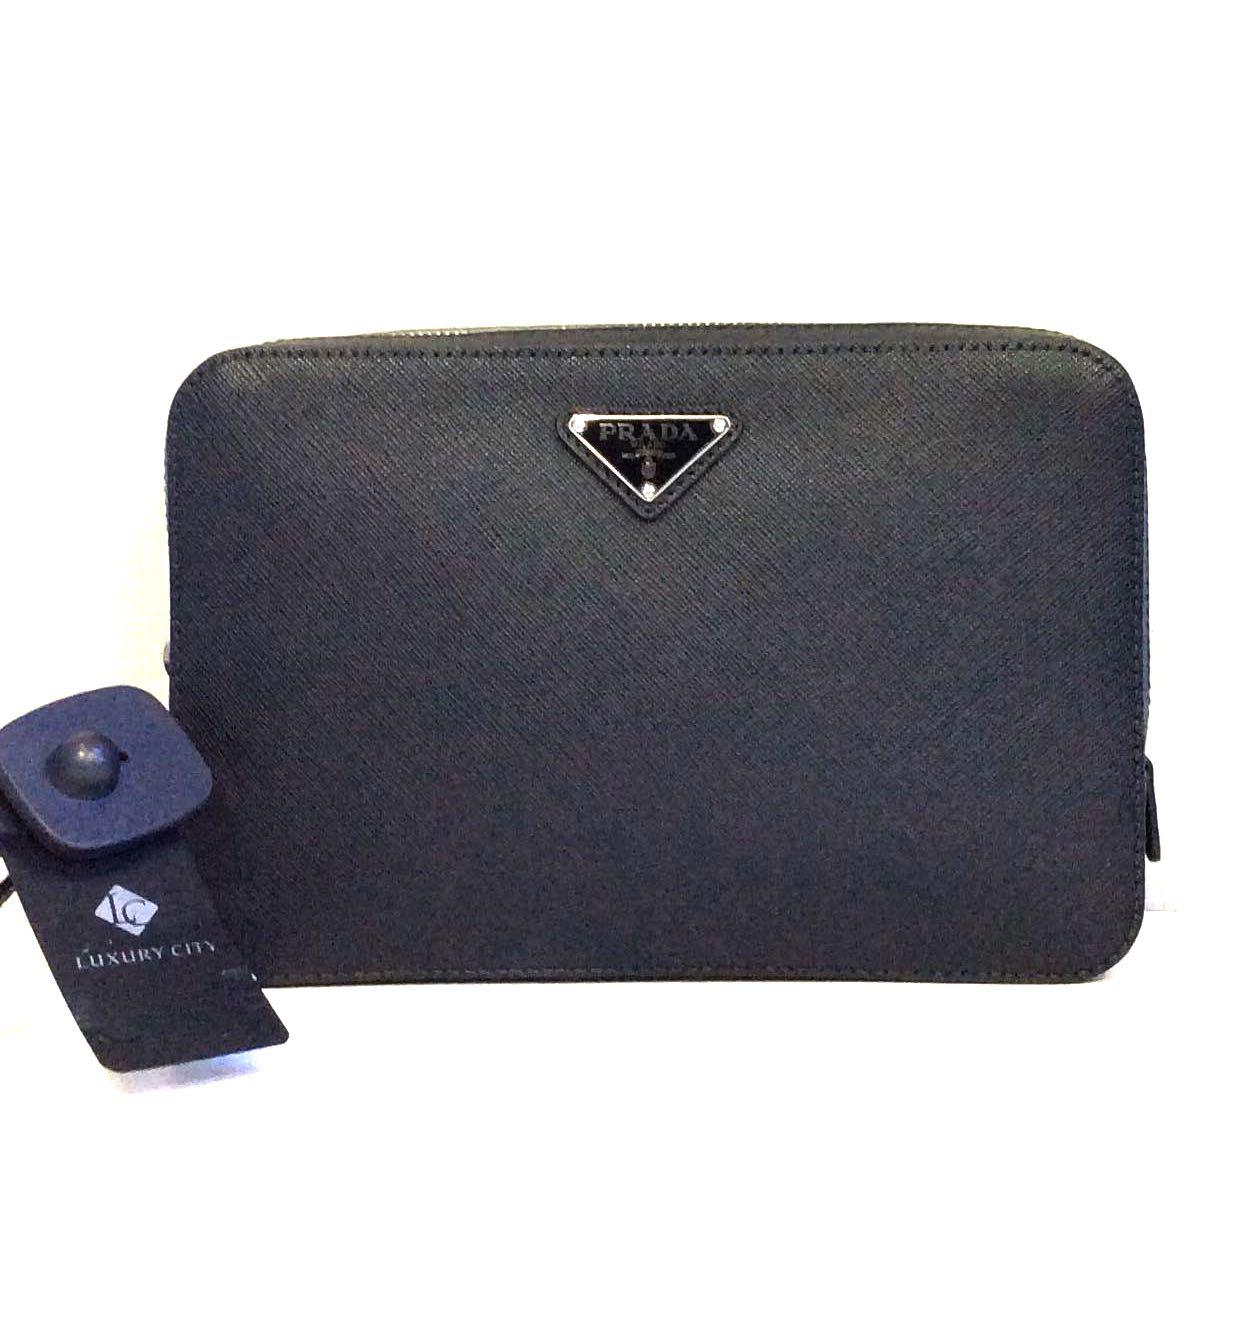 f8312eb7e1c5 BrandNew Prada structured Logo Pouch, Men's Fashion, Bags & Wallets ...